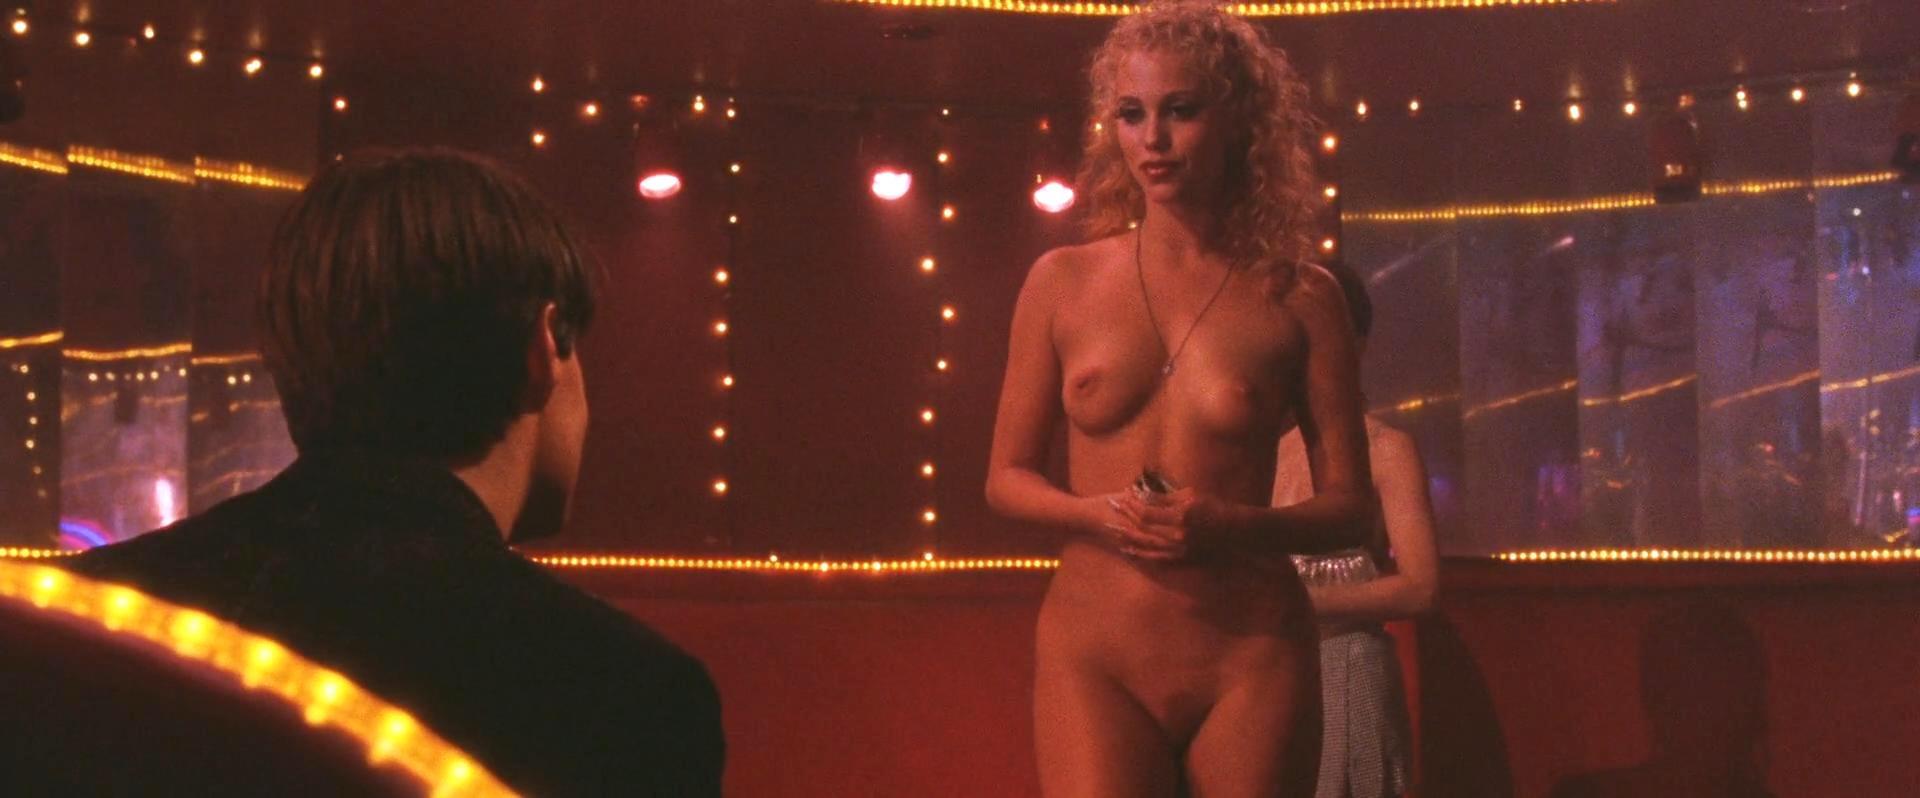 Шоу герлз эротика галереи порно фото